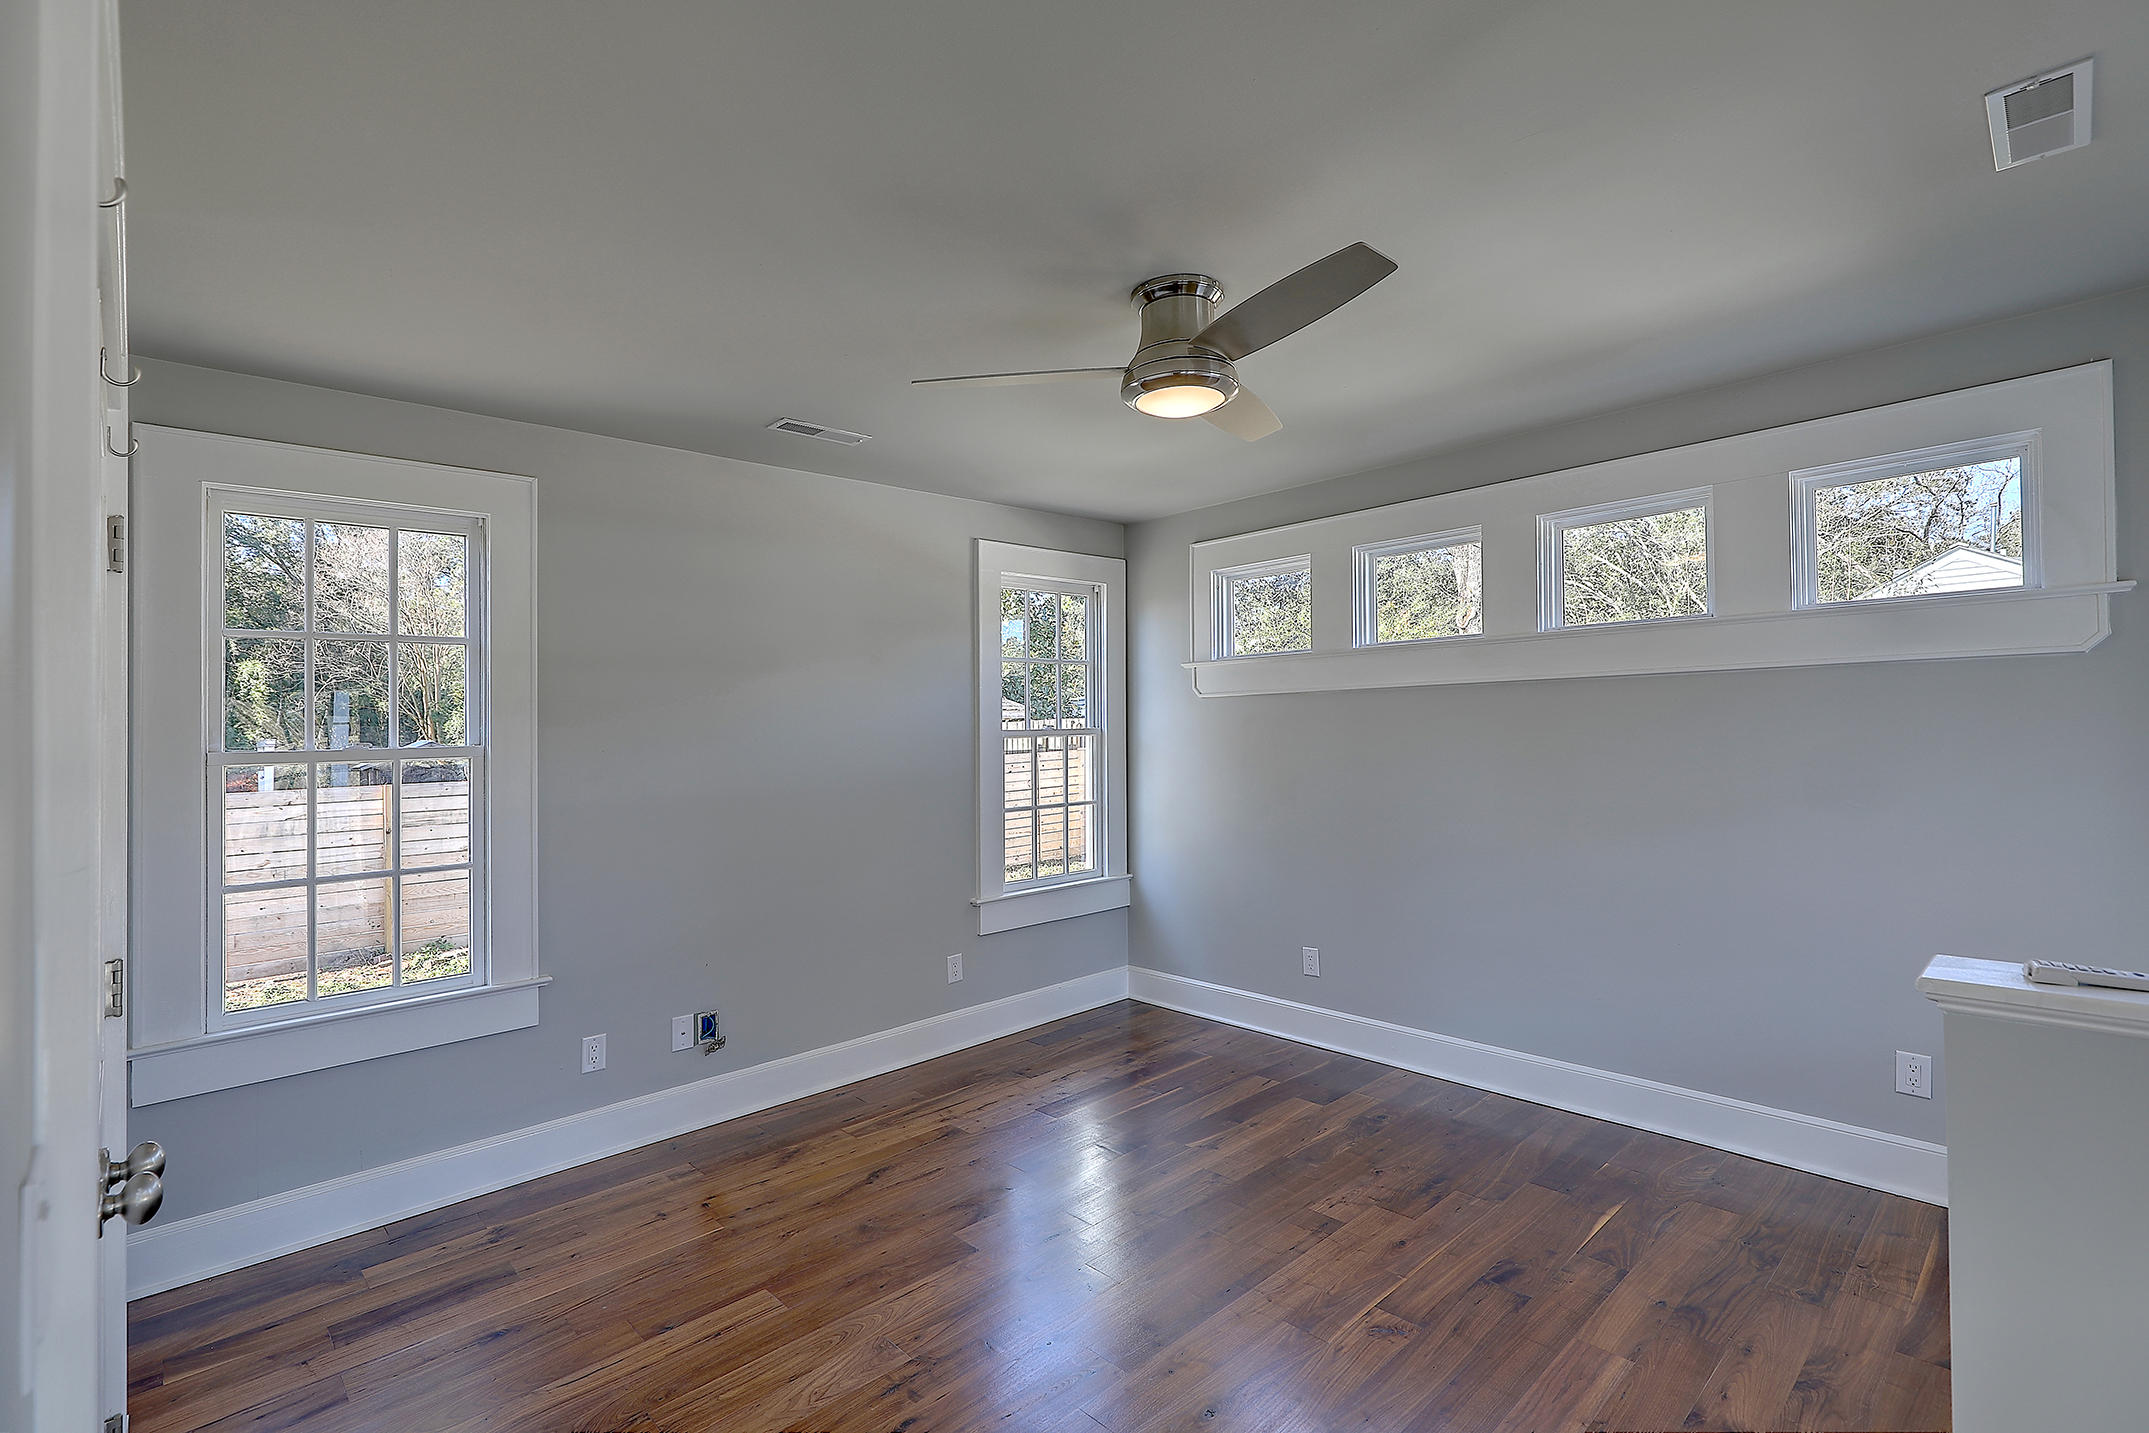 Riverland Terrace Homes For Sale - 2166 St James, Charleston, SC - 28